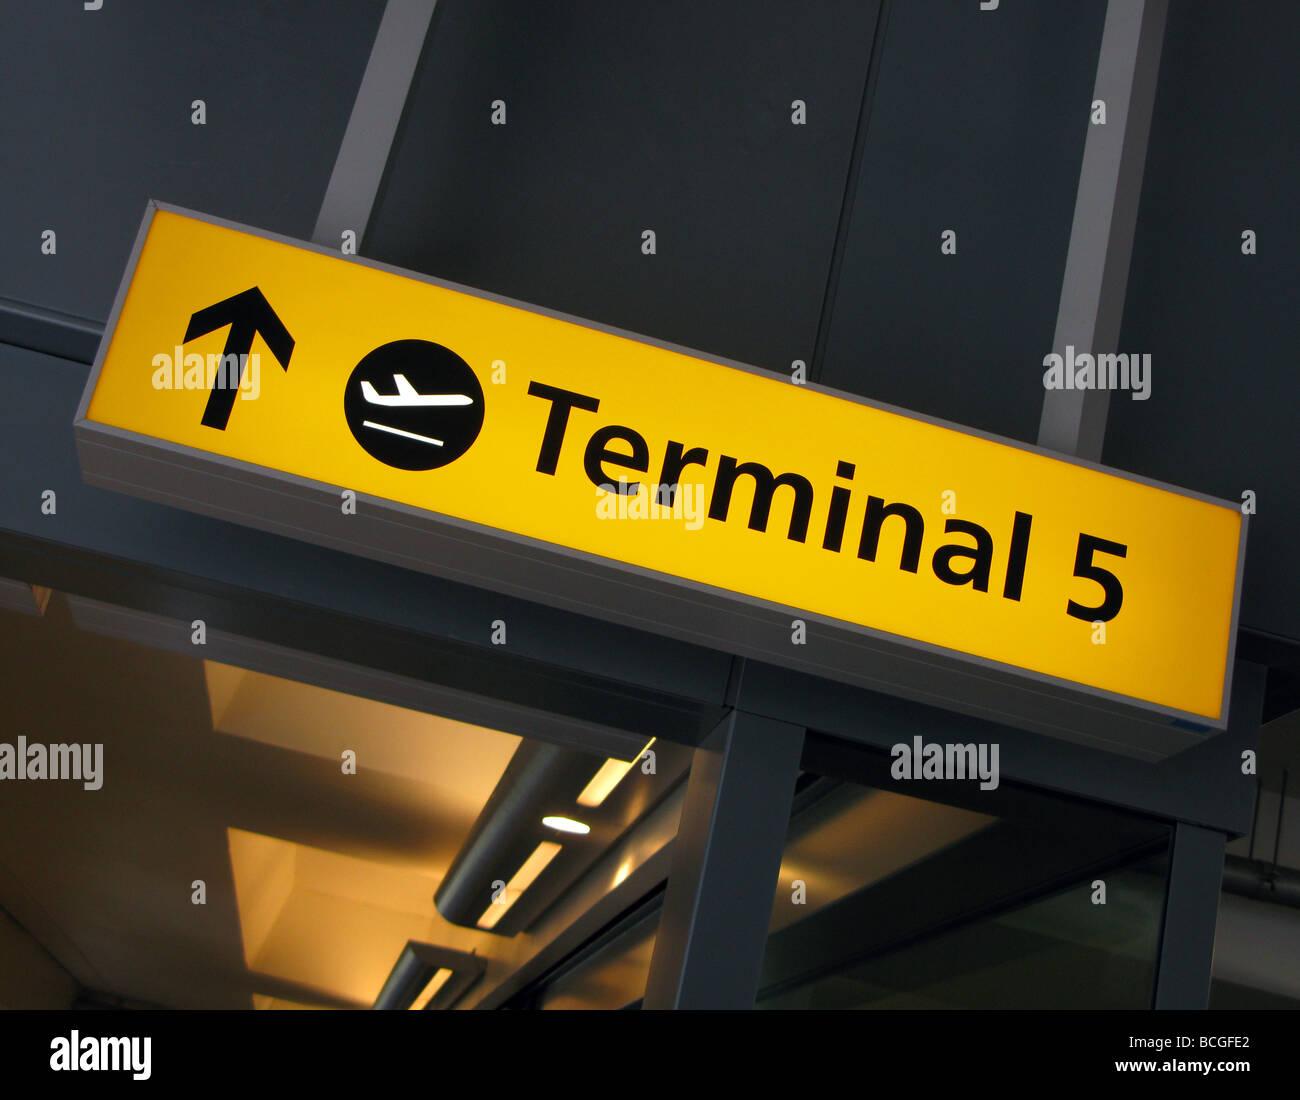 Heathrow terminal 5 sign - Stock Image